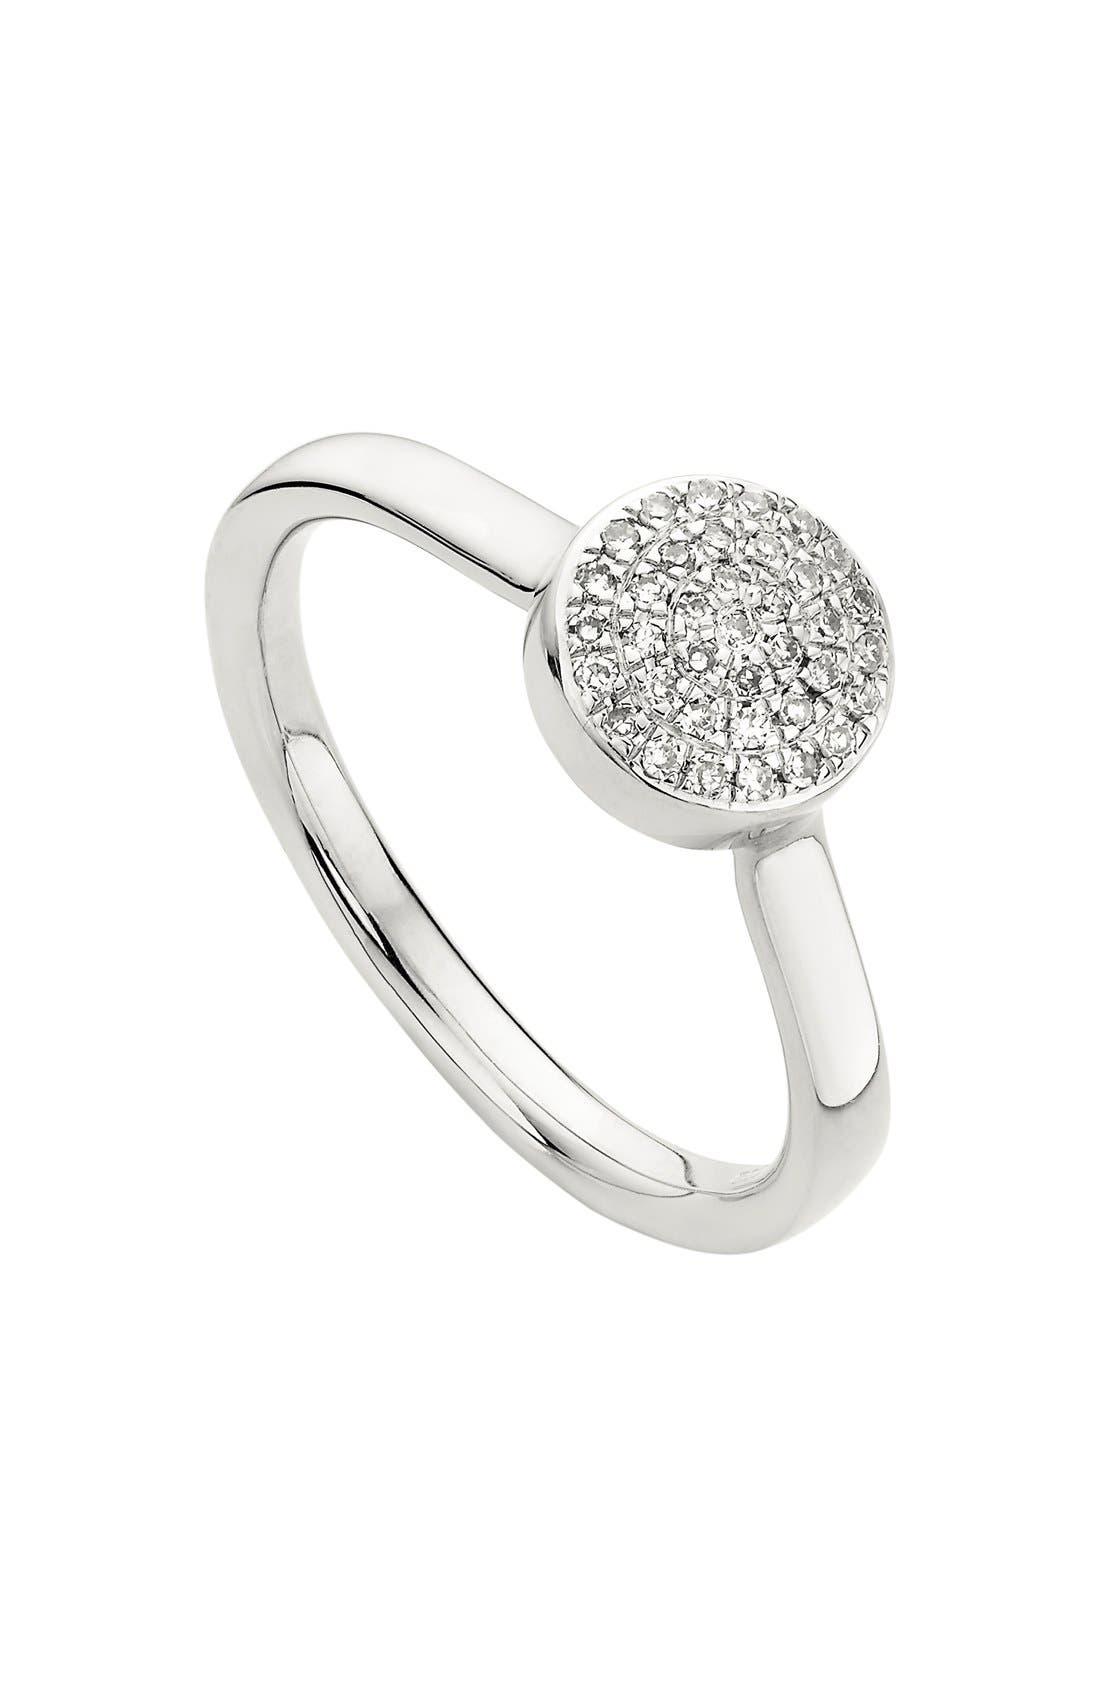 MONICA VINADER Ava Diamond Button Ring, Main, color, SILVER